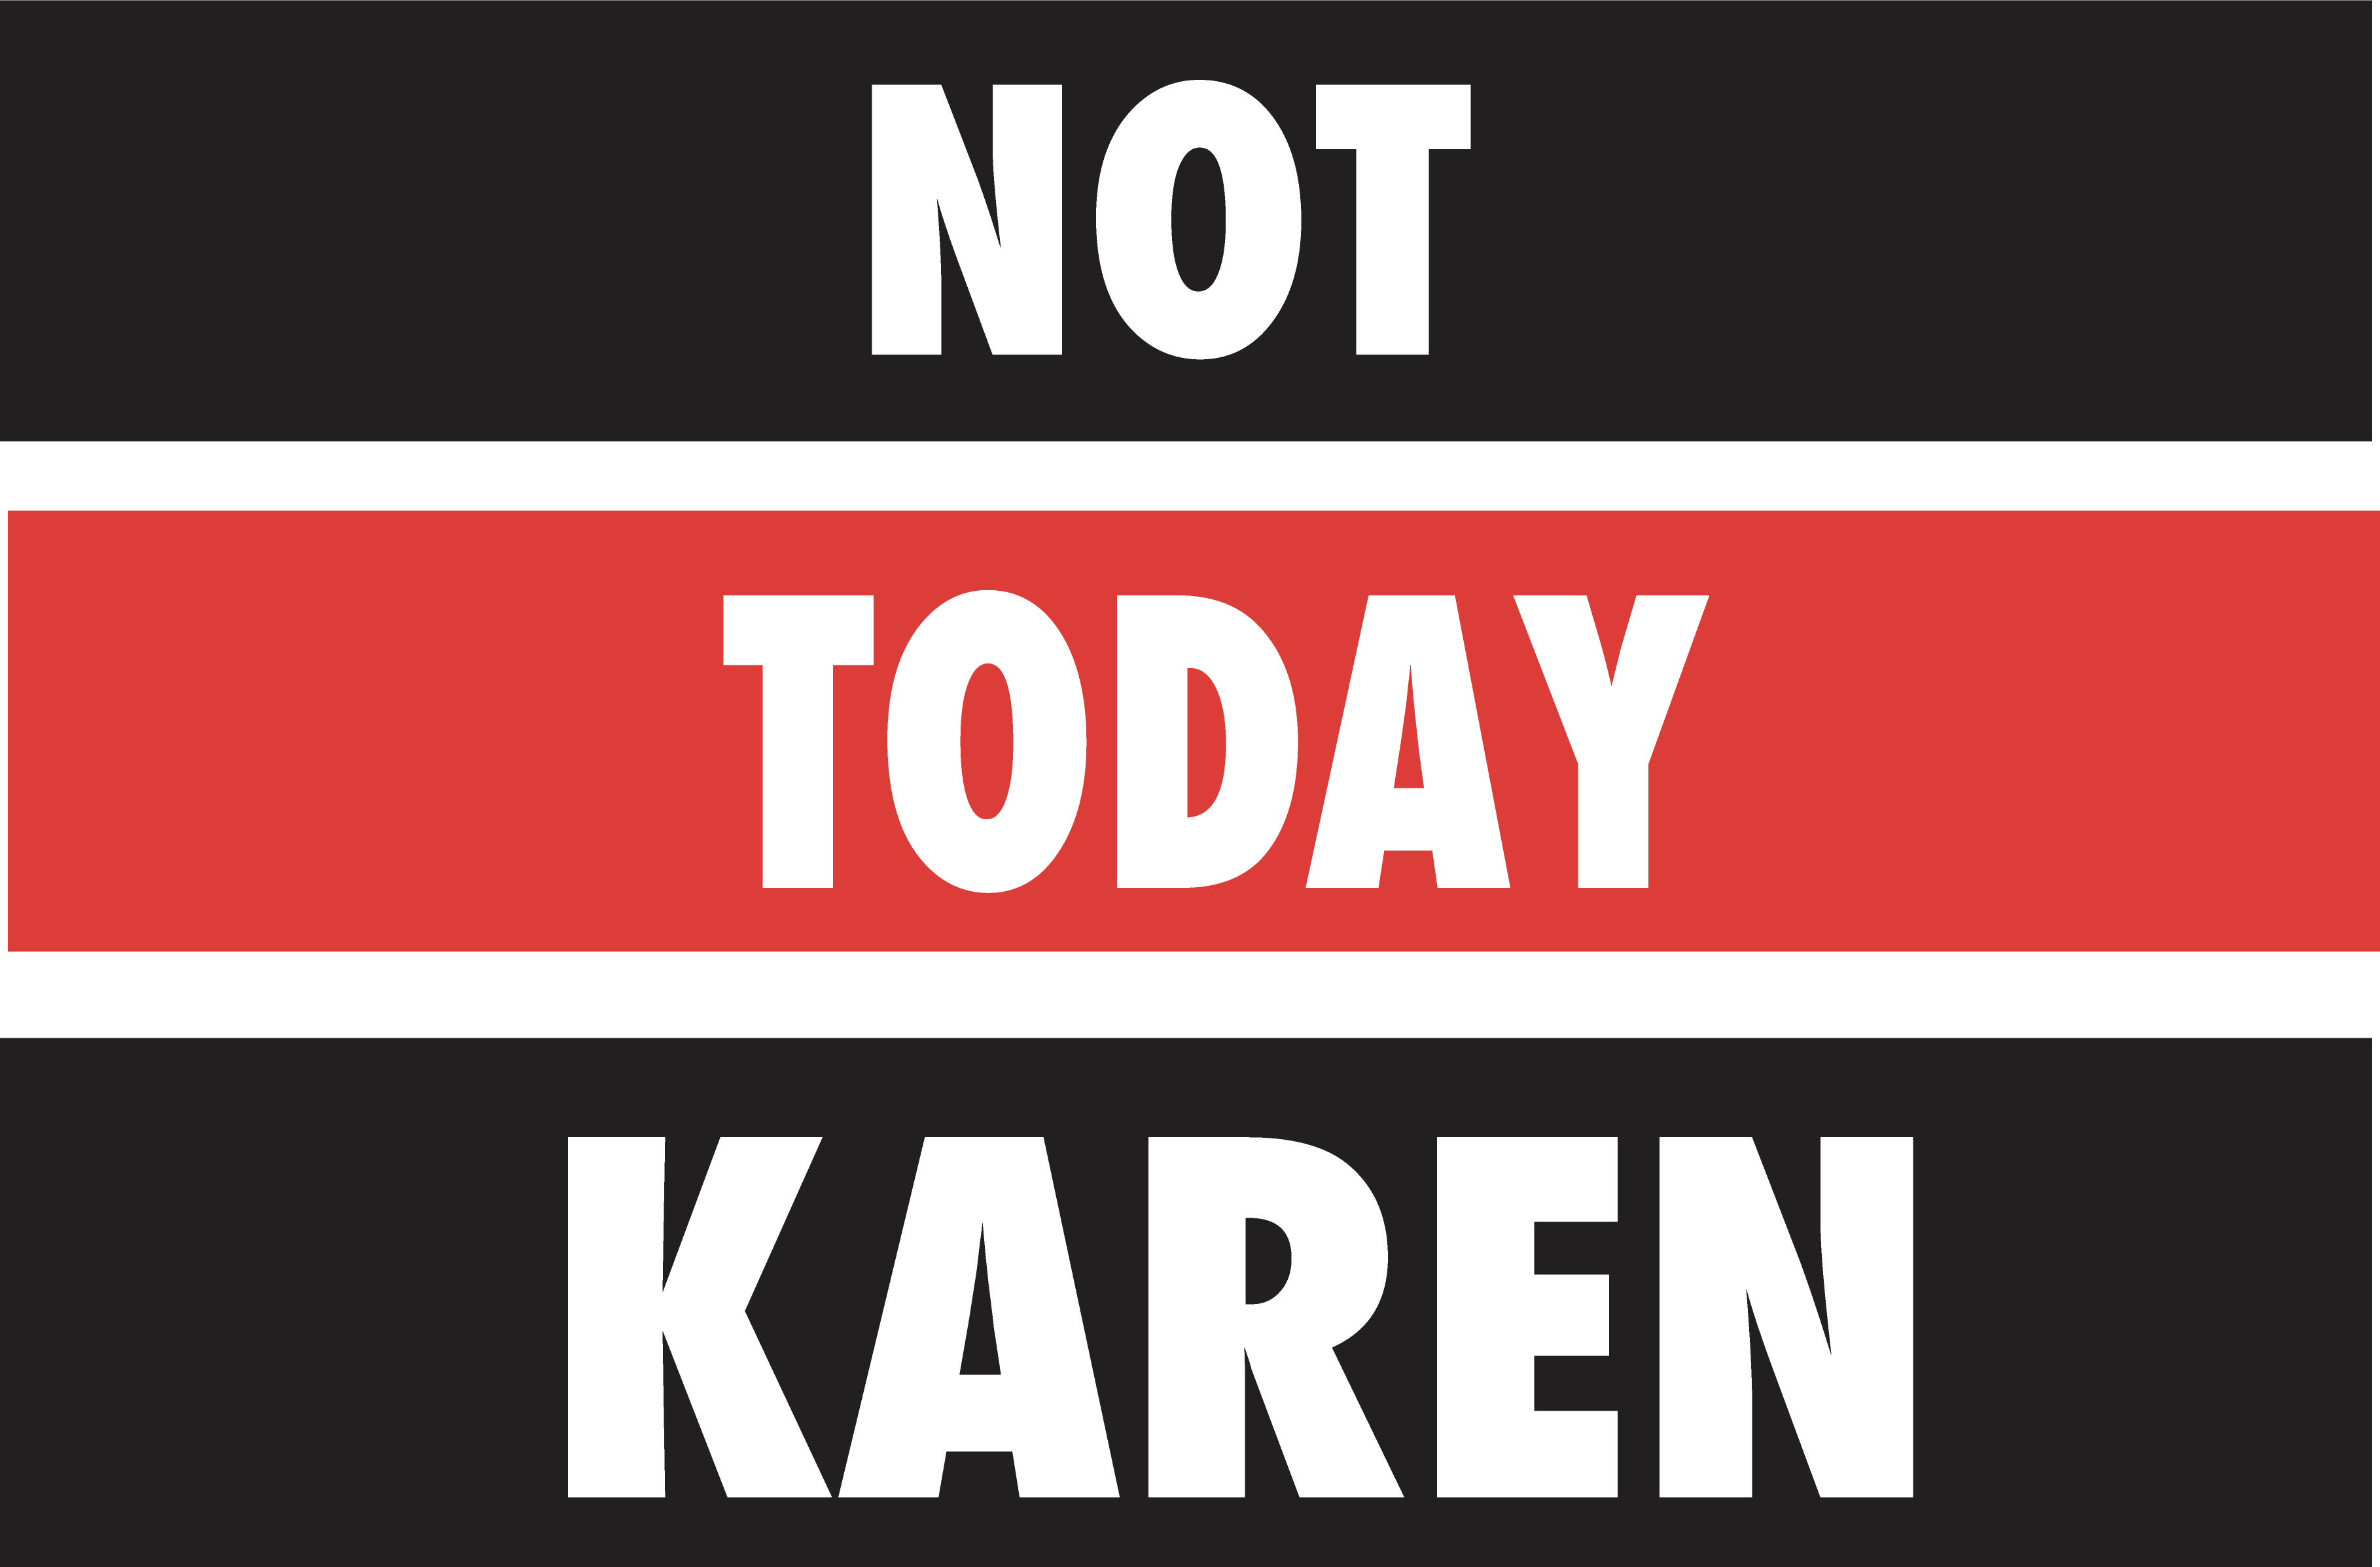 Download Not today karen SVG in 2020   Silhouette machine, I wish ...